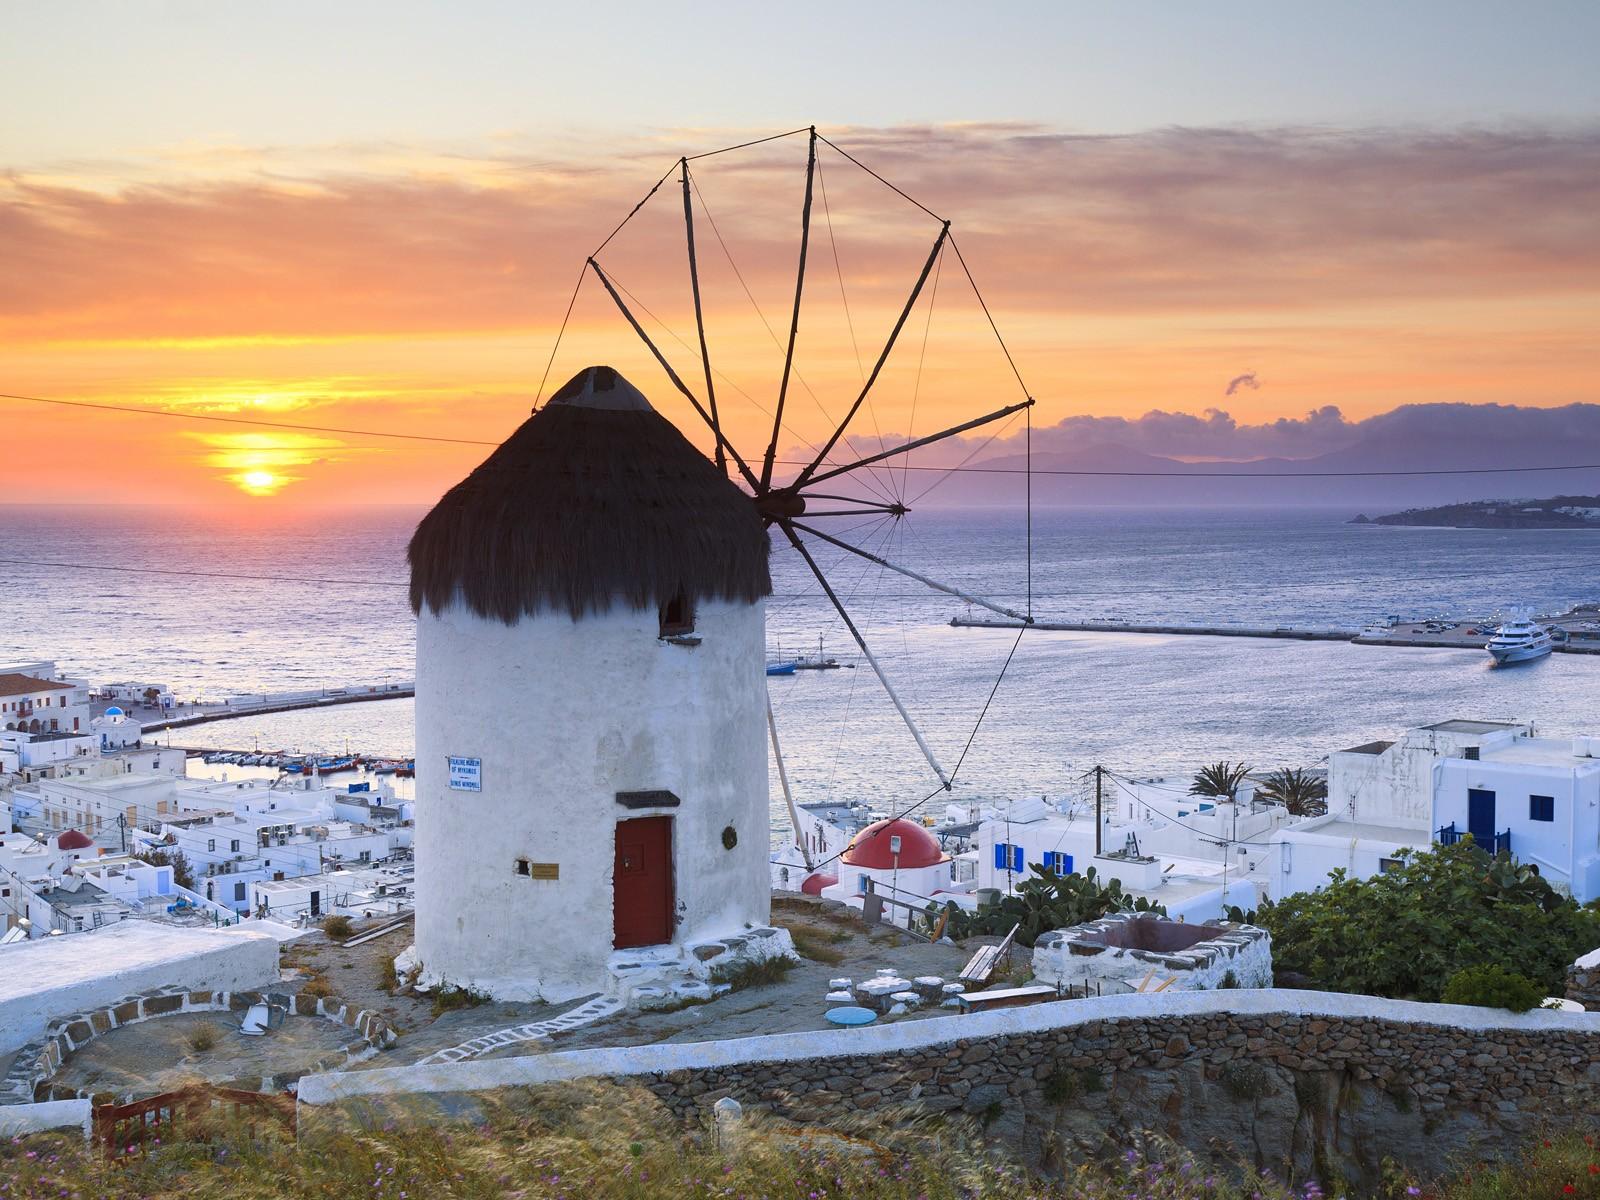 landscapes_Greece_1600x1200